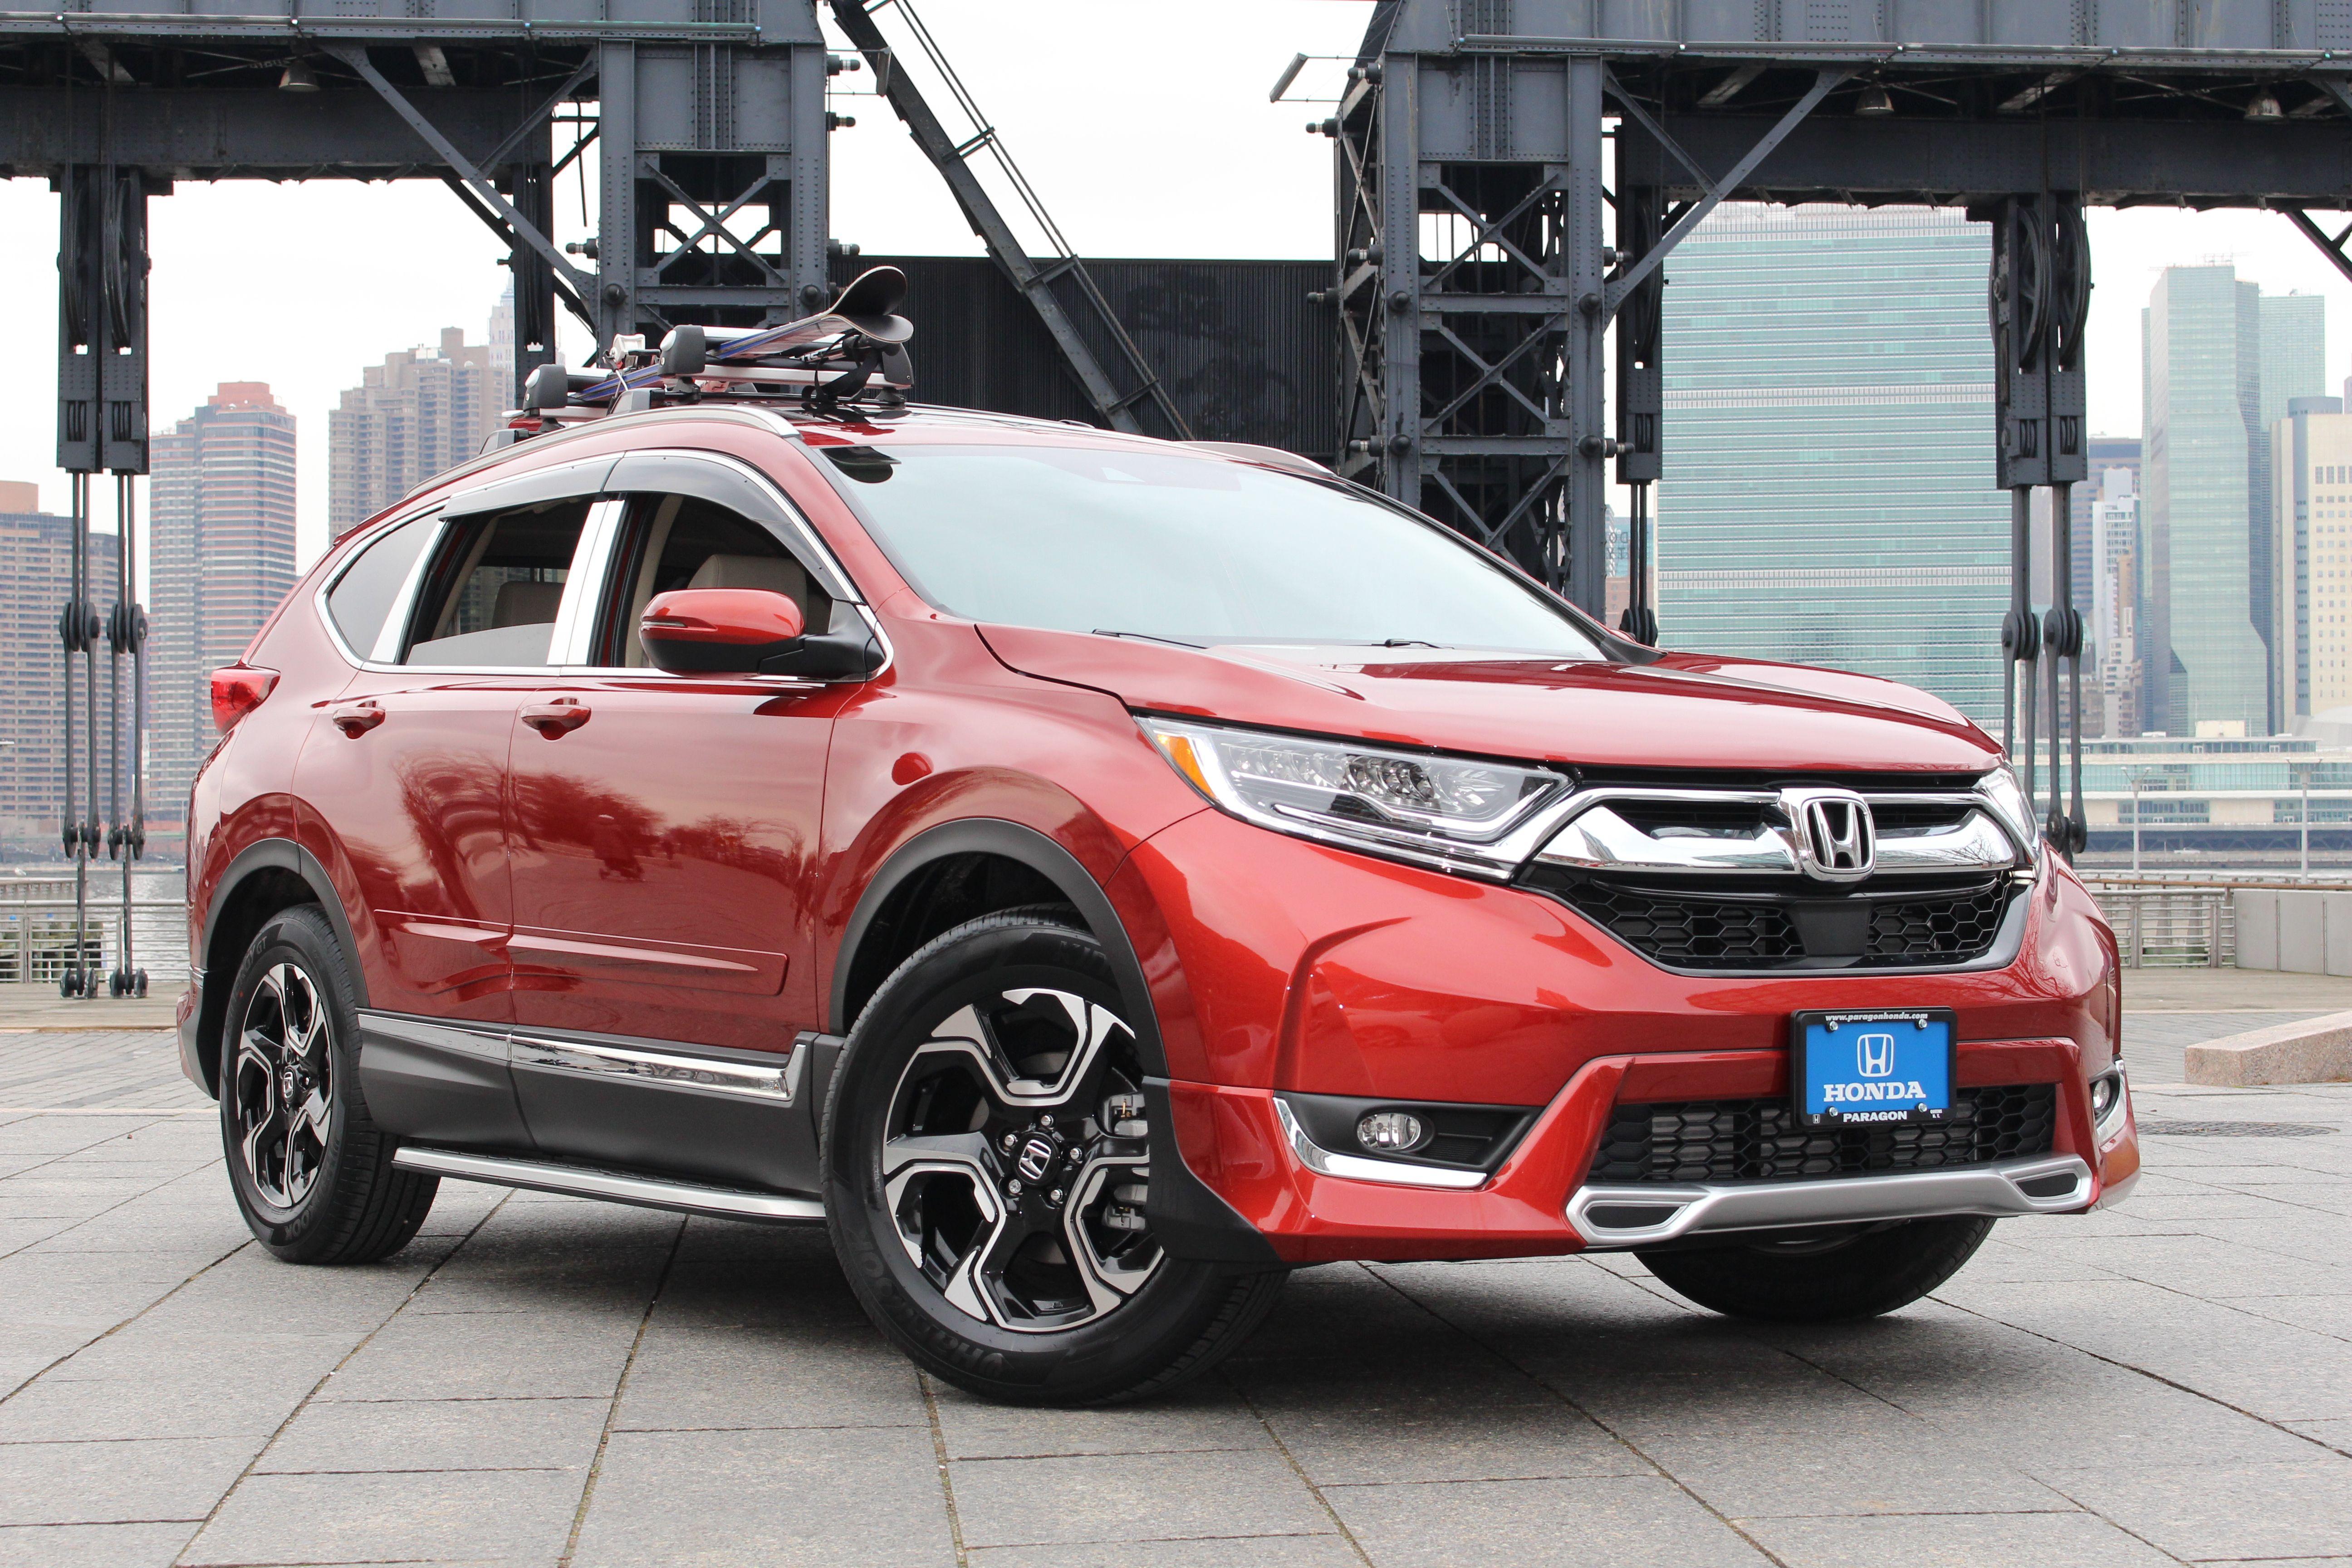 Brand new custom 2017 Honda CRV at Paragon Honda. Honda